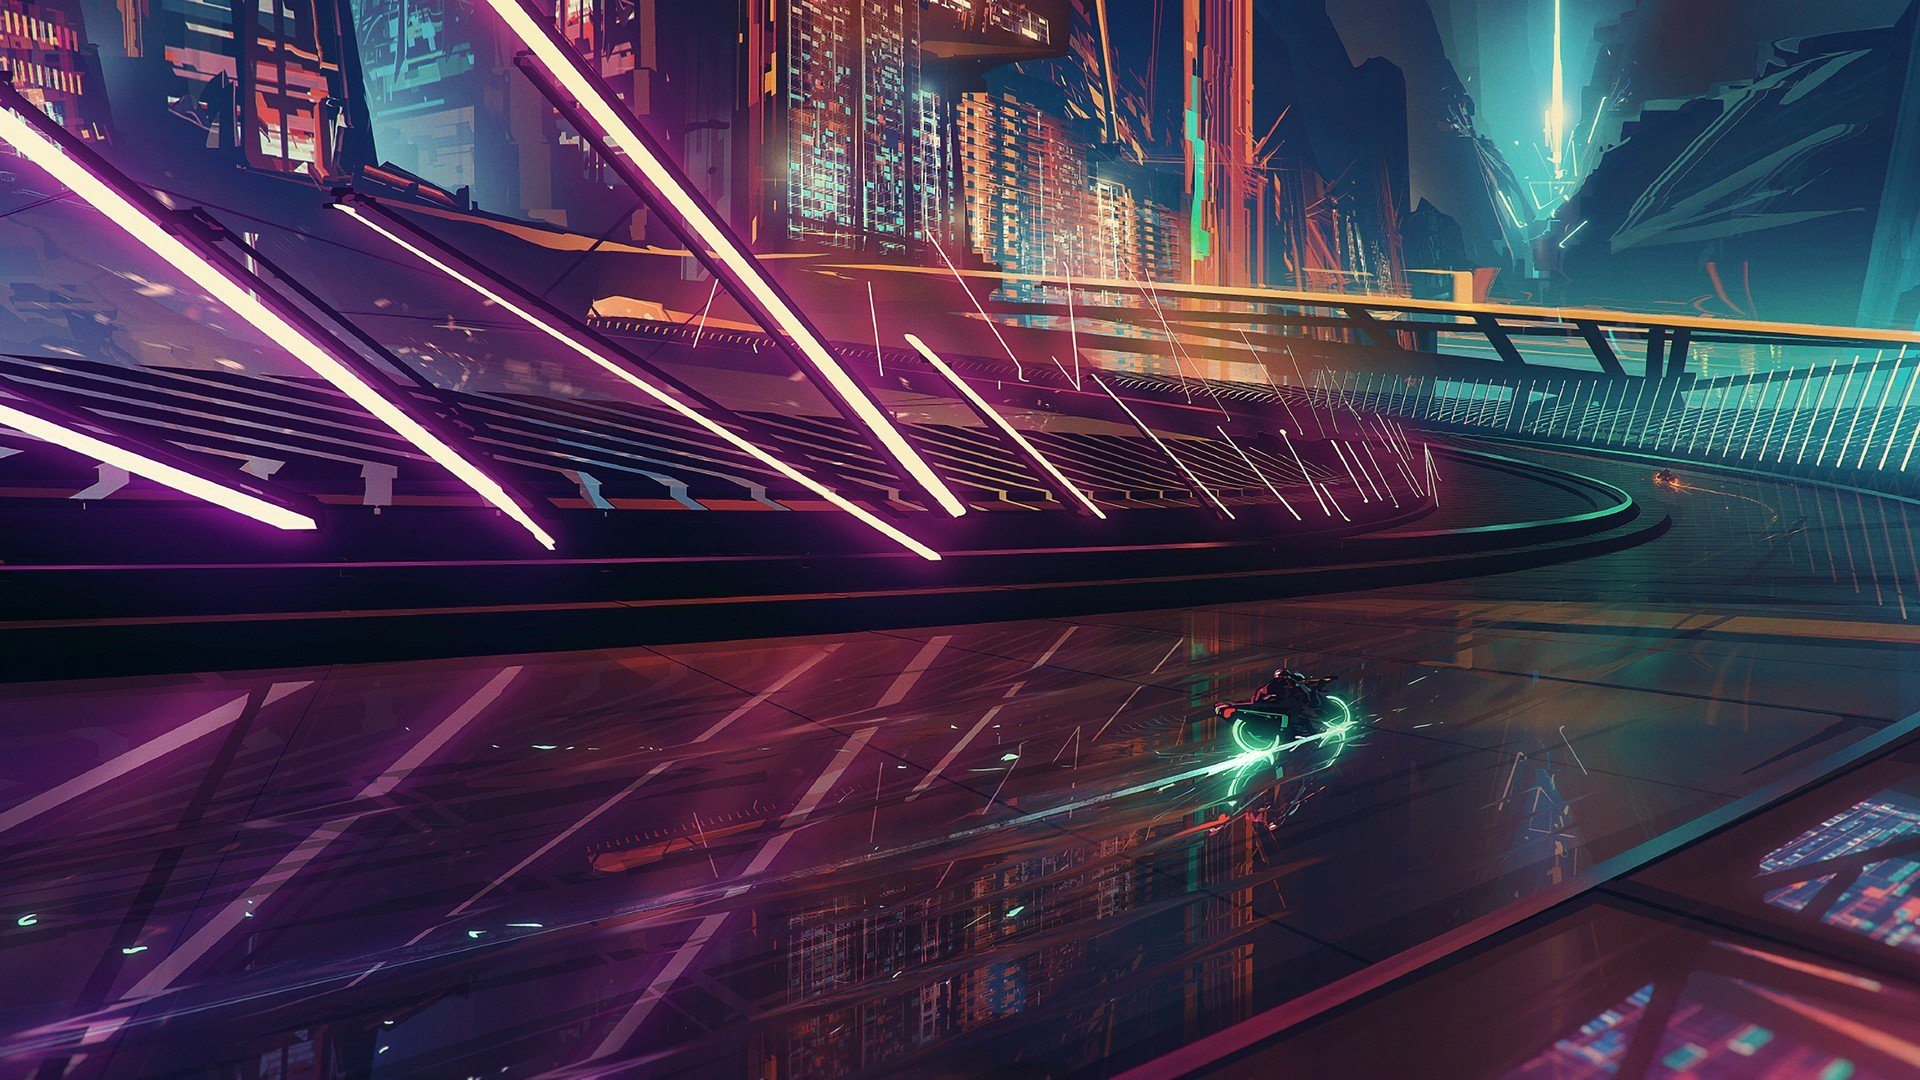 cyberpunk city hd wallpapers - photo #22